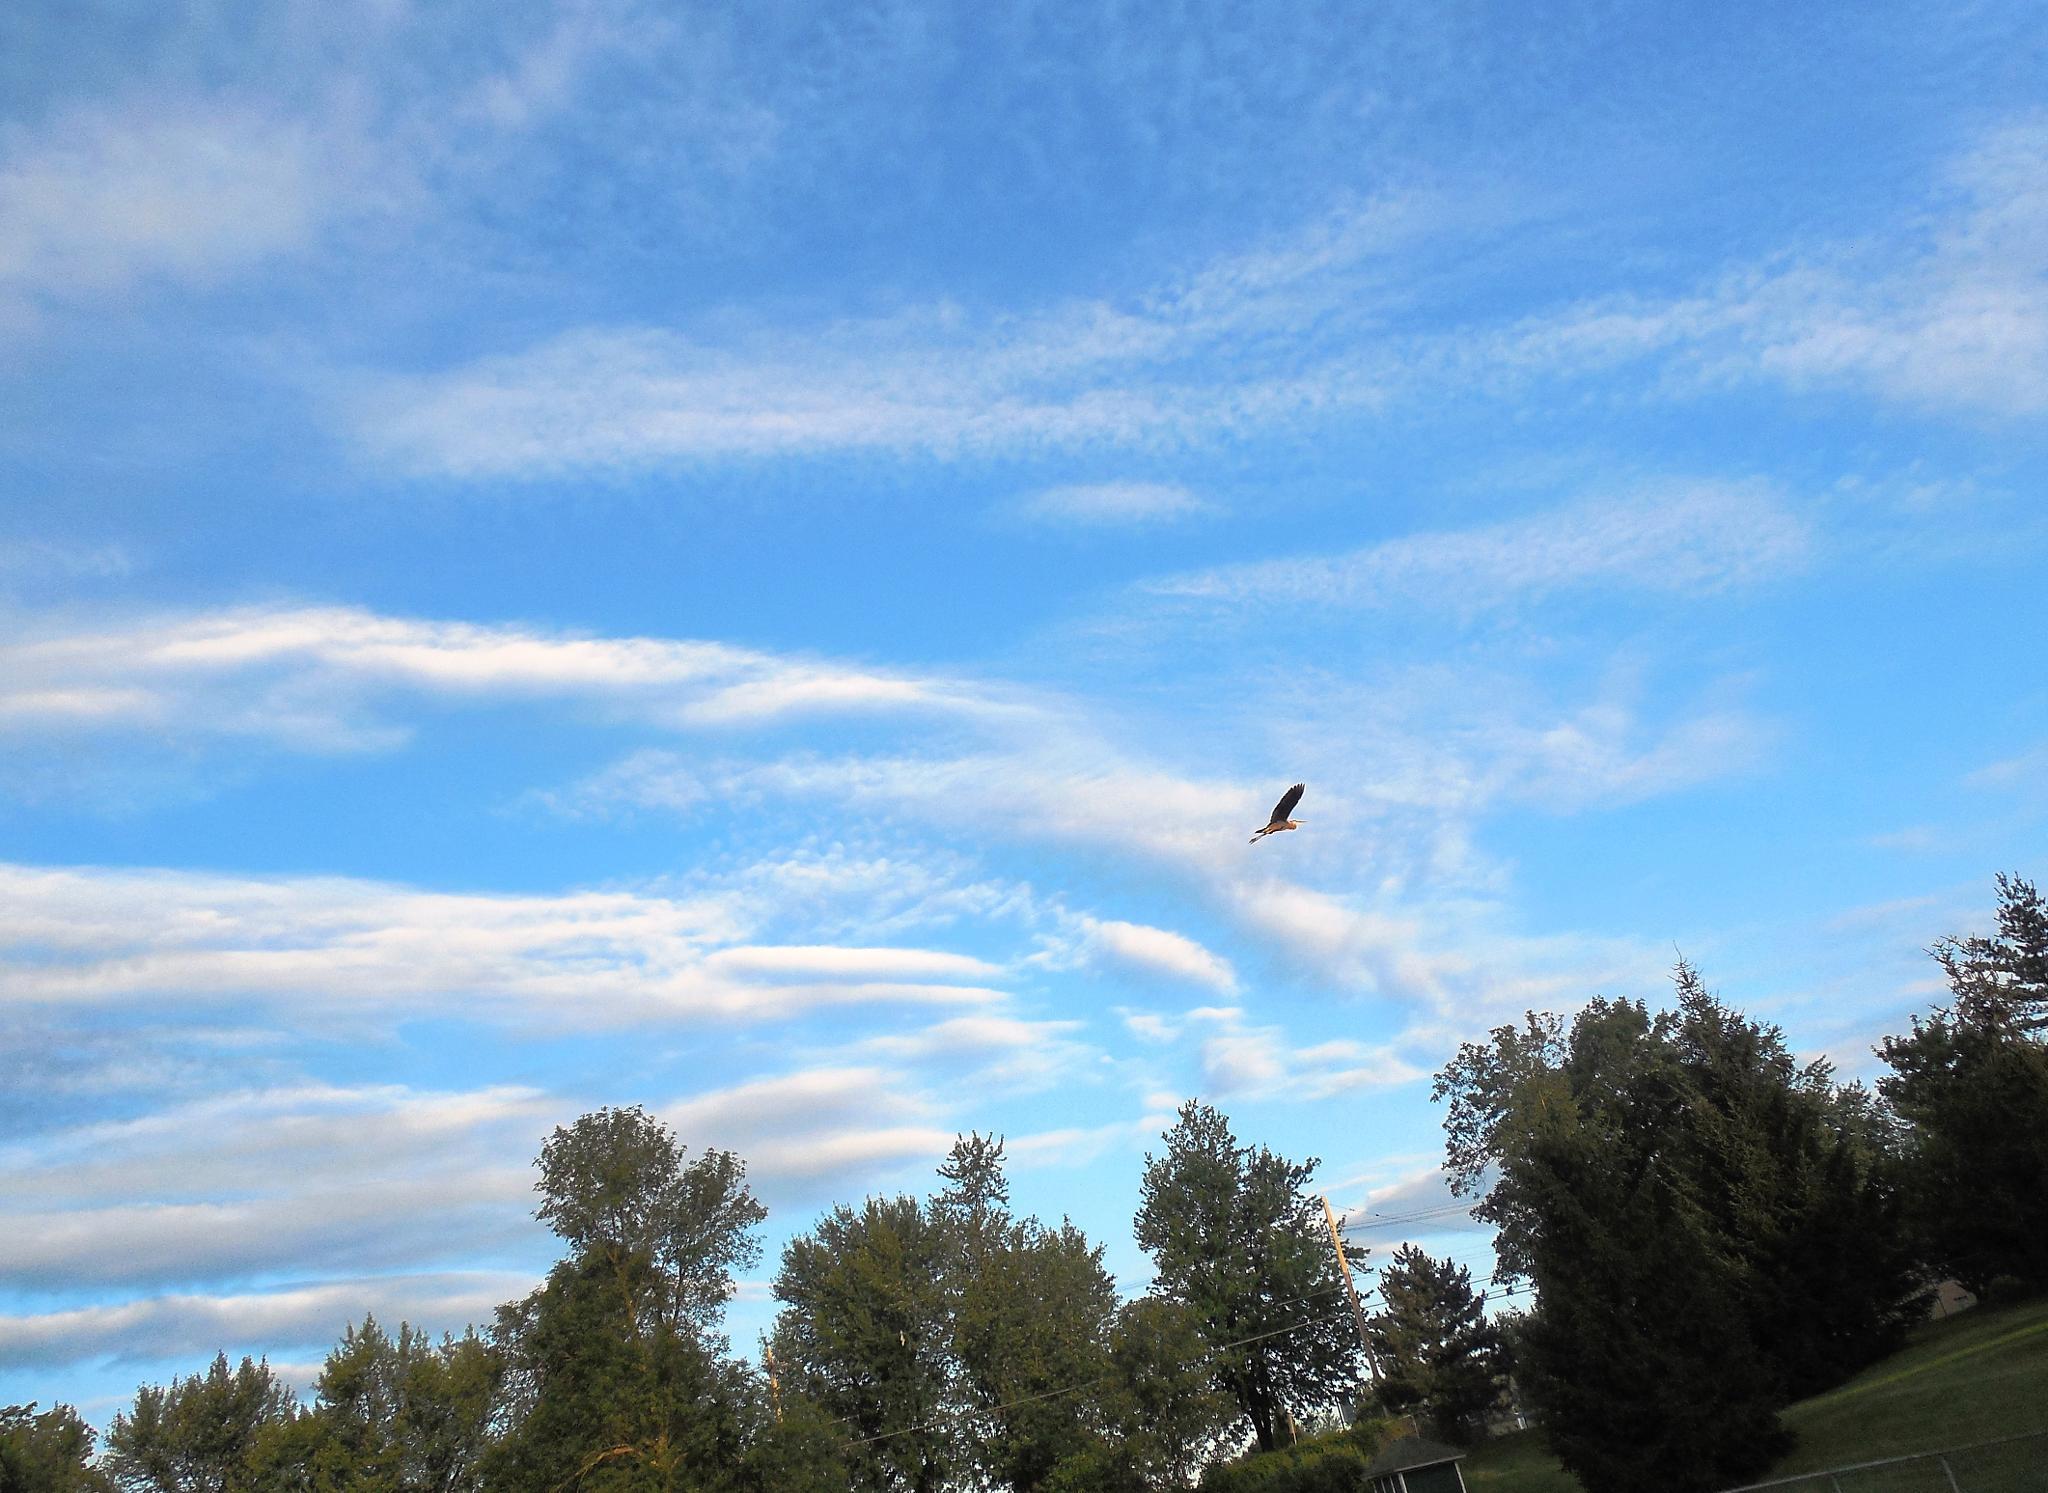 fly away  by Tom Mazur